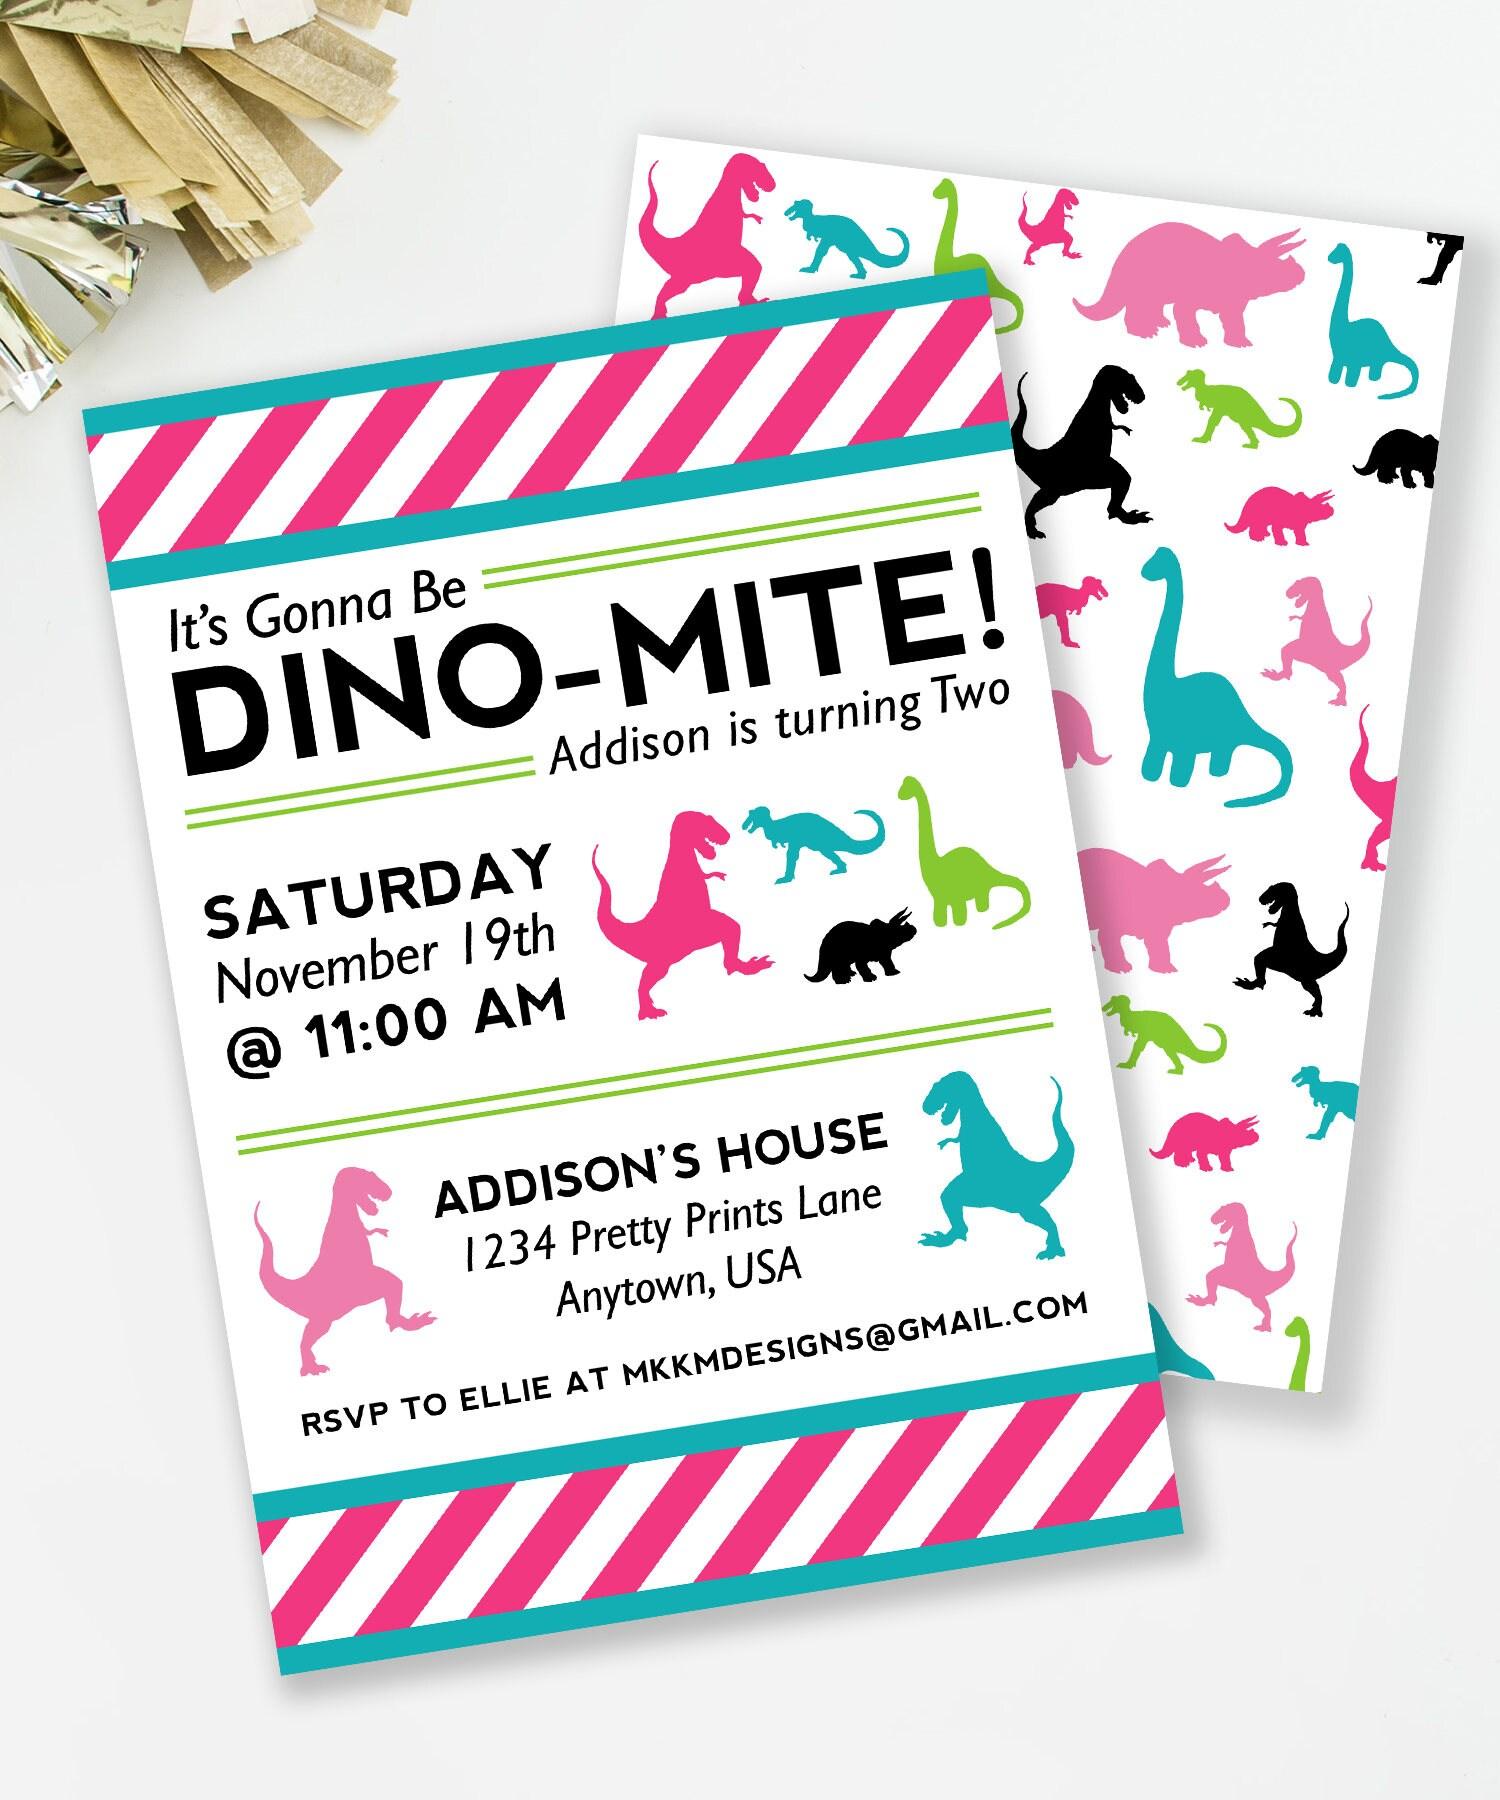 Girl dinosaur party dinosaur birthday kit pink dino party girl dinosaur party dinosaur birthday kit pink dino party dinosaur decor dinosaur filmwisefo